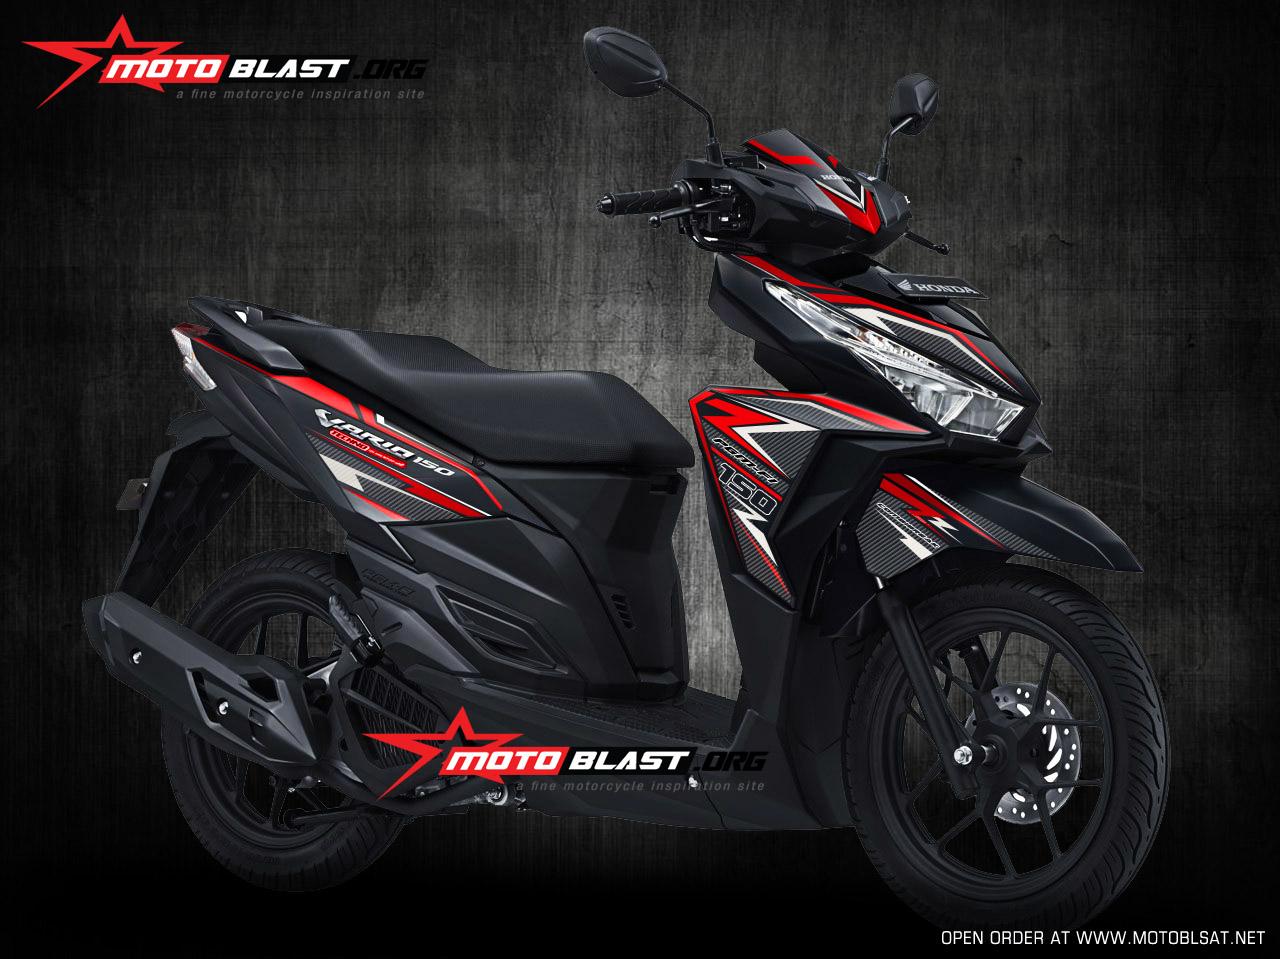 Koleksi Ide Modifikasi Motor Vario 150 Black Terbaru Velgy Motor